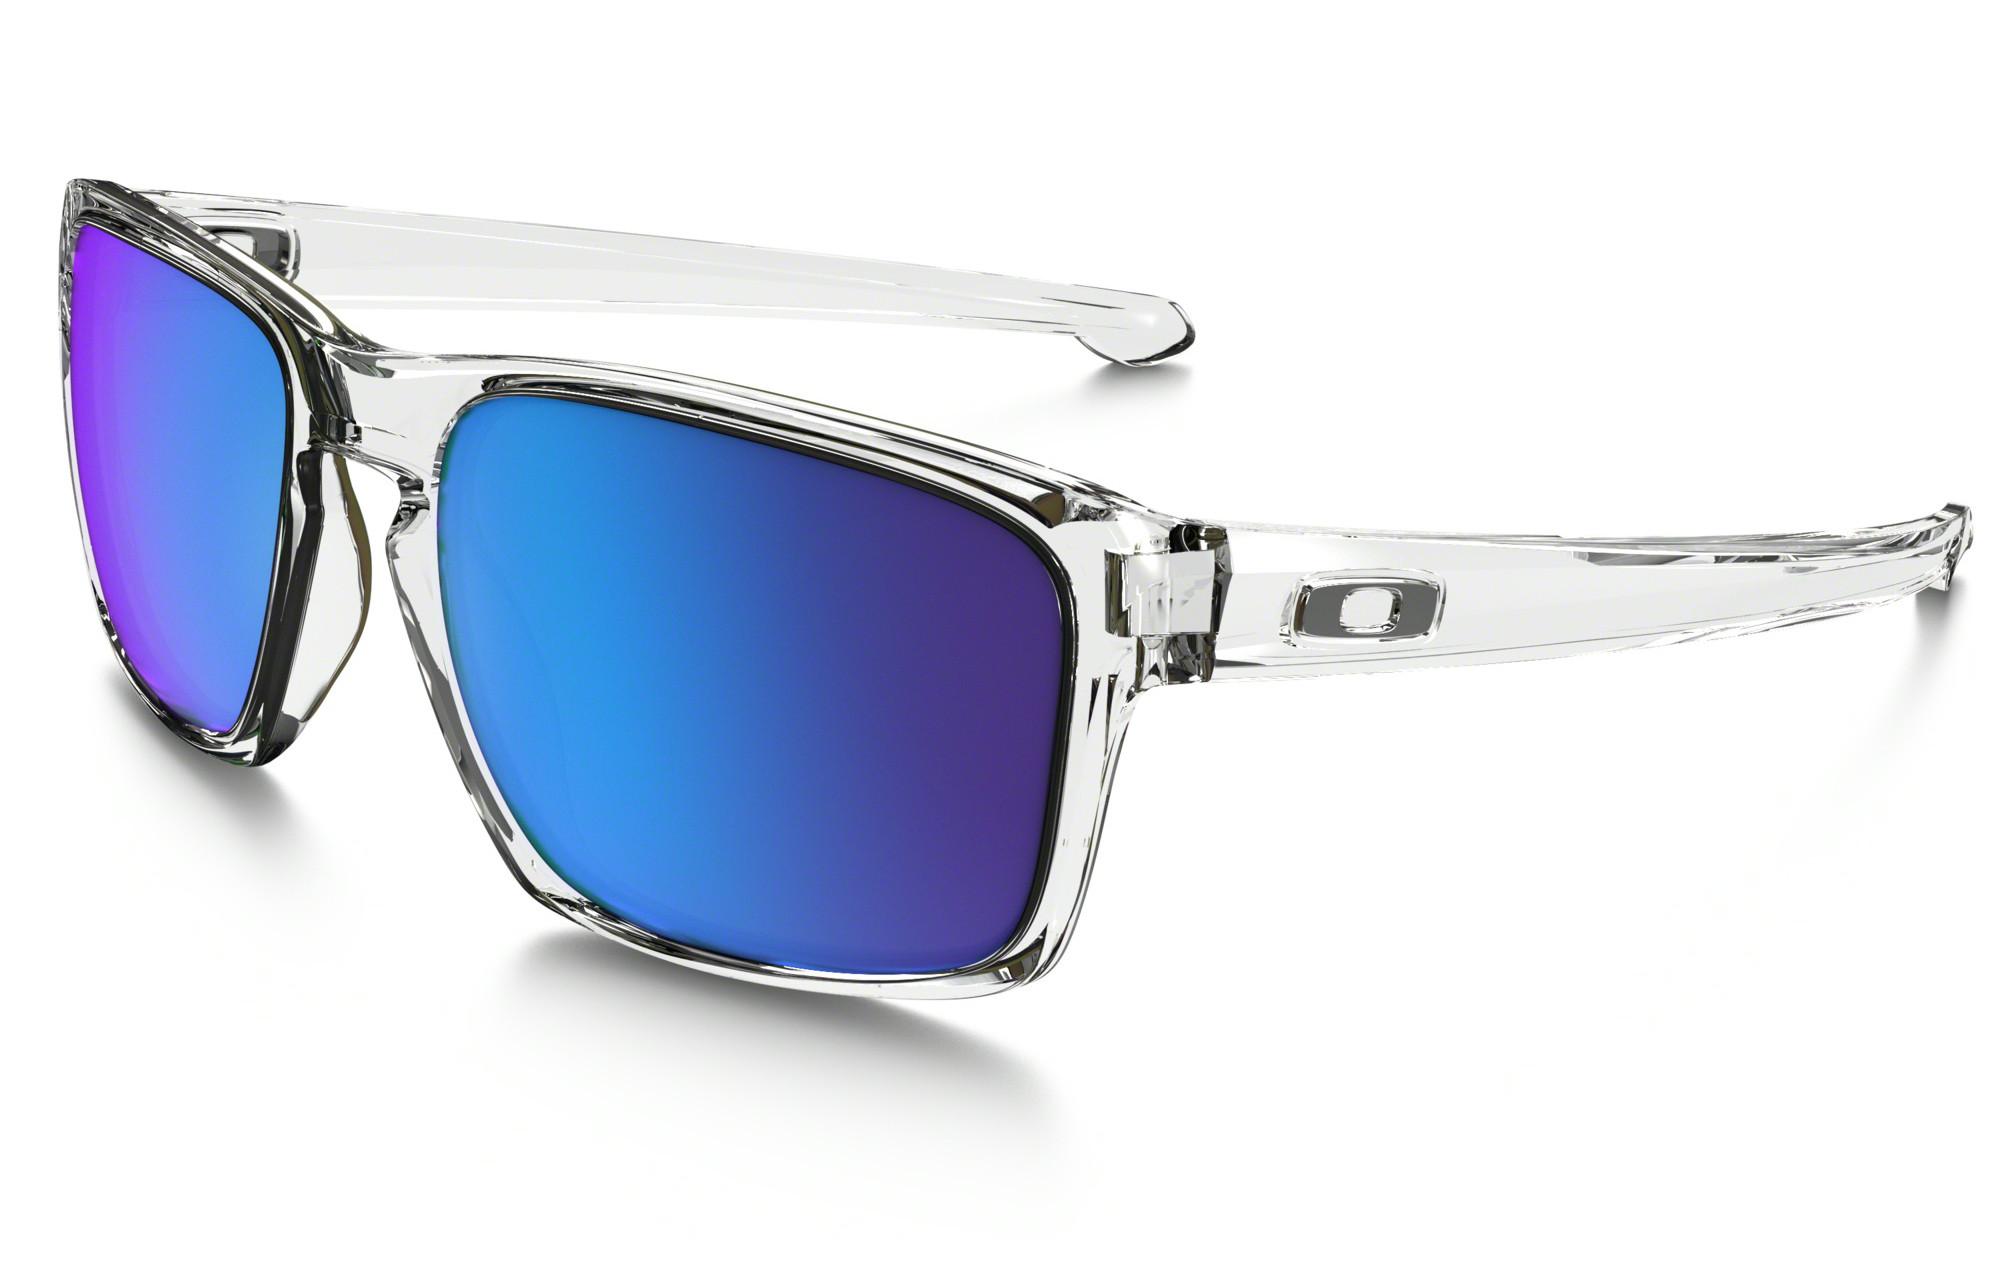 f636de4eb05 Gafas Oakley Sliver clear blue Iridium   Miroir OO9262-06